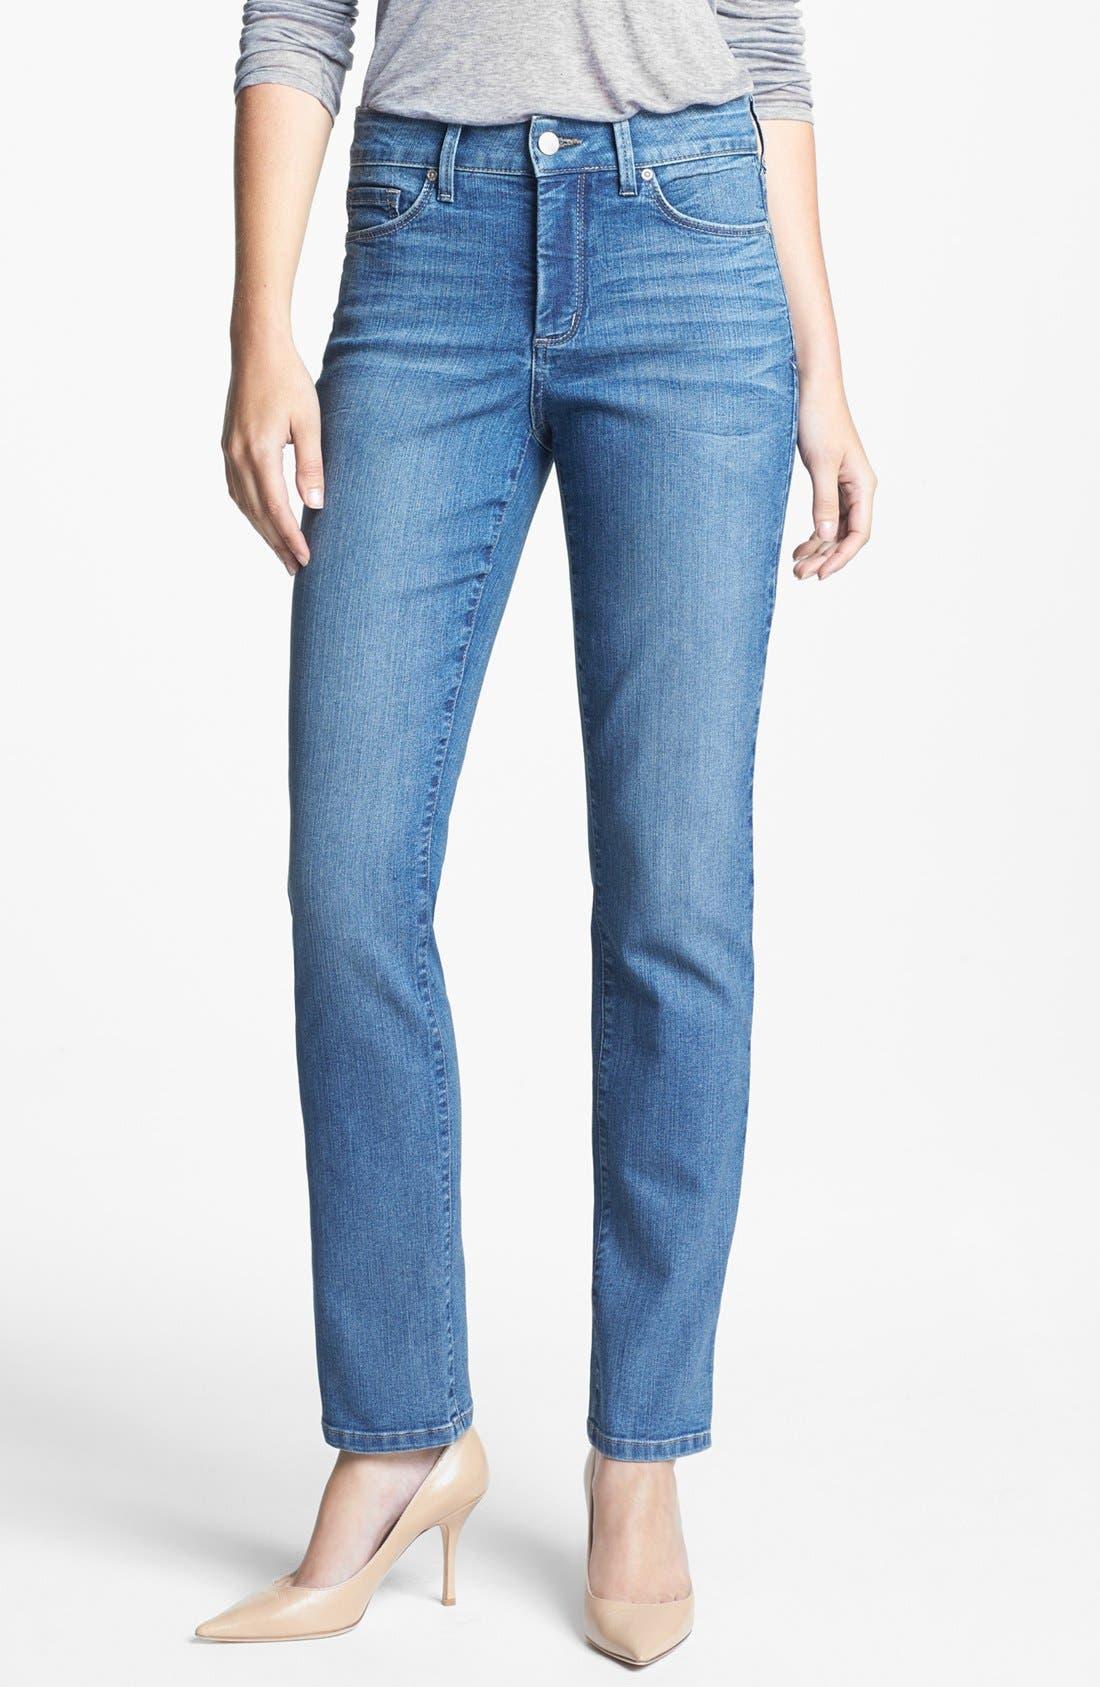 Alternate Image 1 Selected - NYDJ 'Sheri' Stretch Skinny Jeans (Ontario) (Petite)